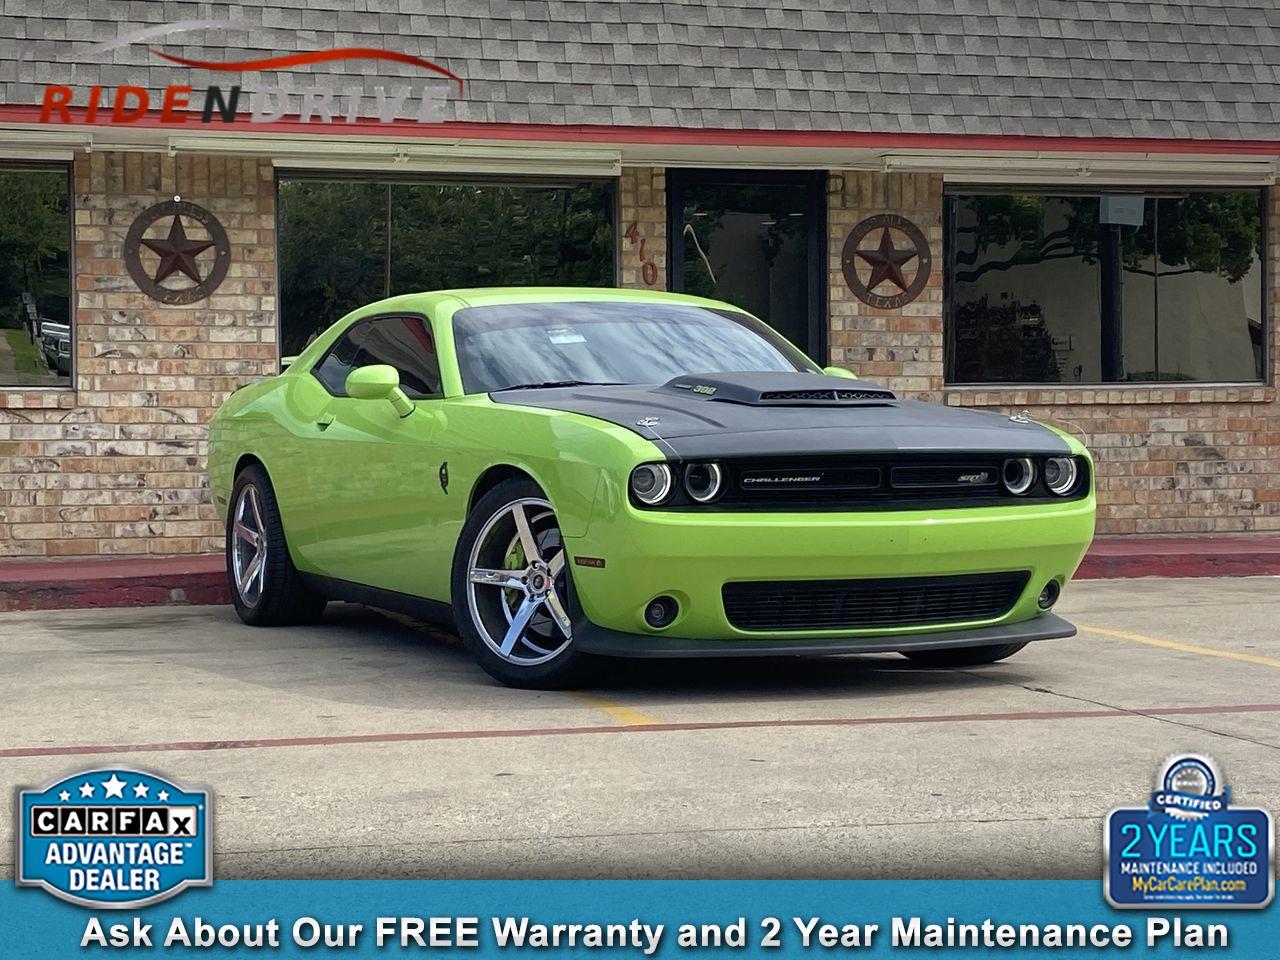 2015 Dodge Challenger 2dr Cpe R/T Scat Pack Shaker